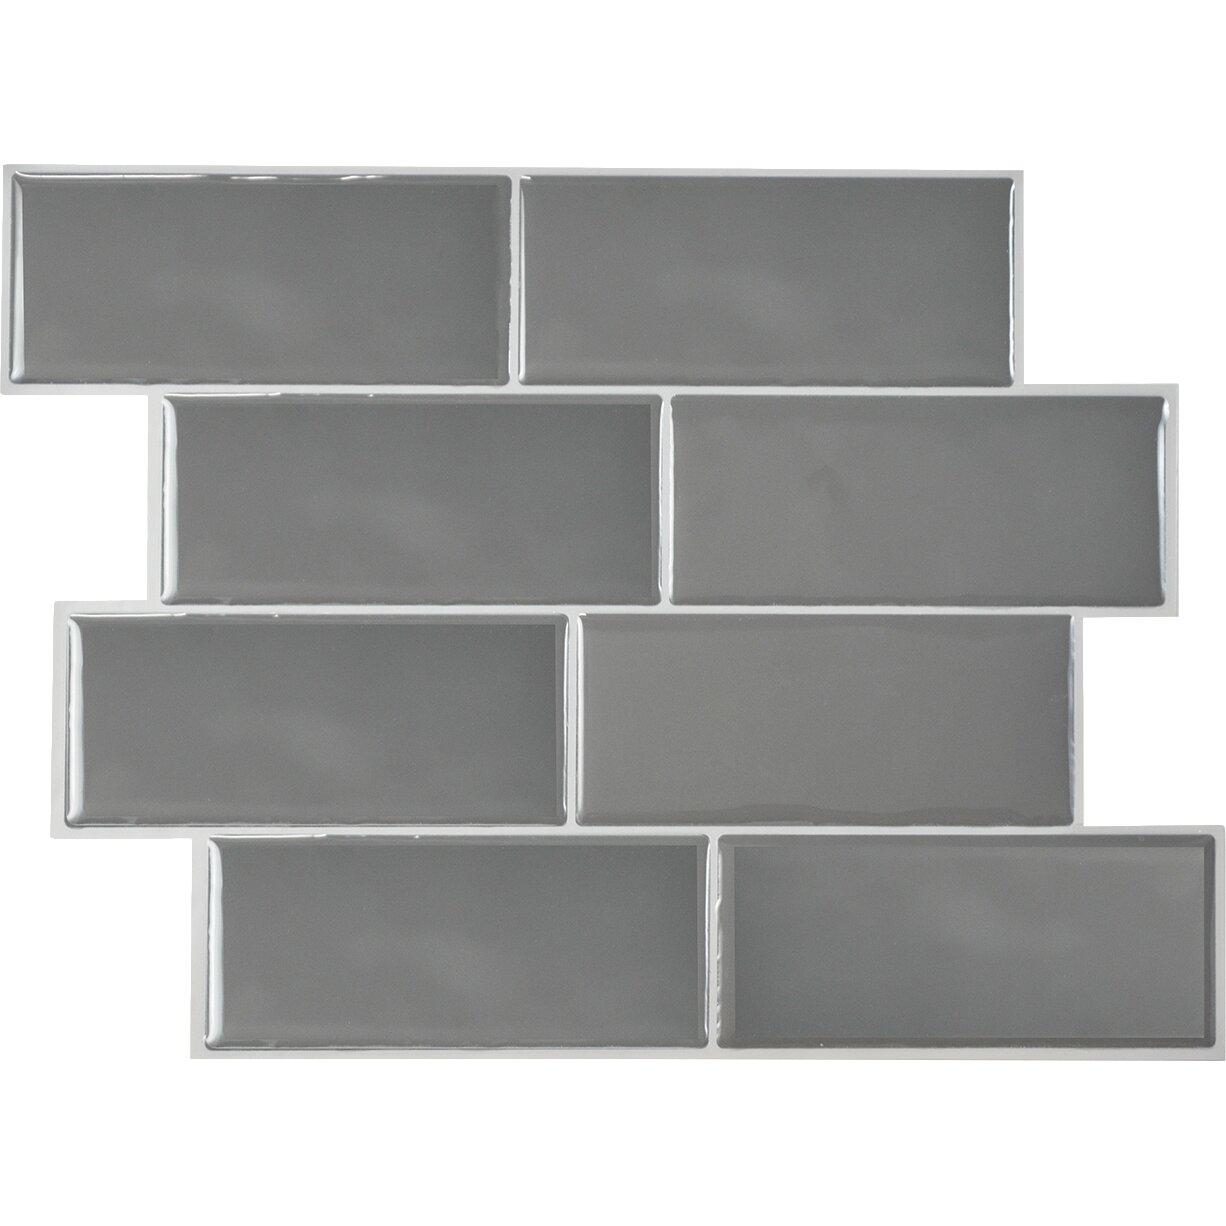 smart tiles mosaik metro grigio x peel stick subway tile in gray reviews wayfair. Black Bedroom Furniture Sets. Home Design Ideas